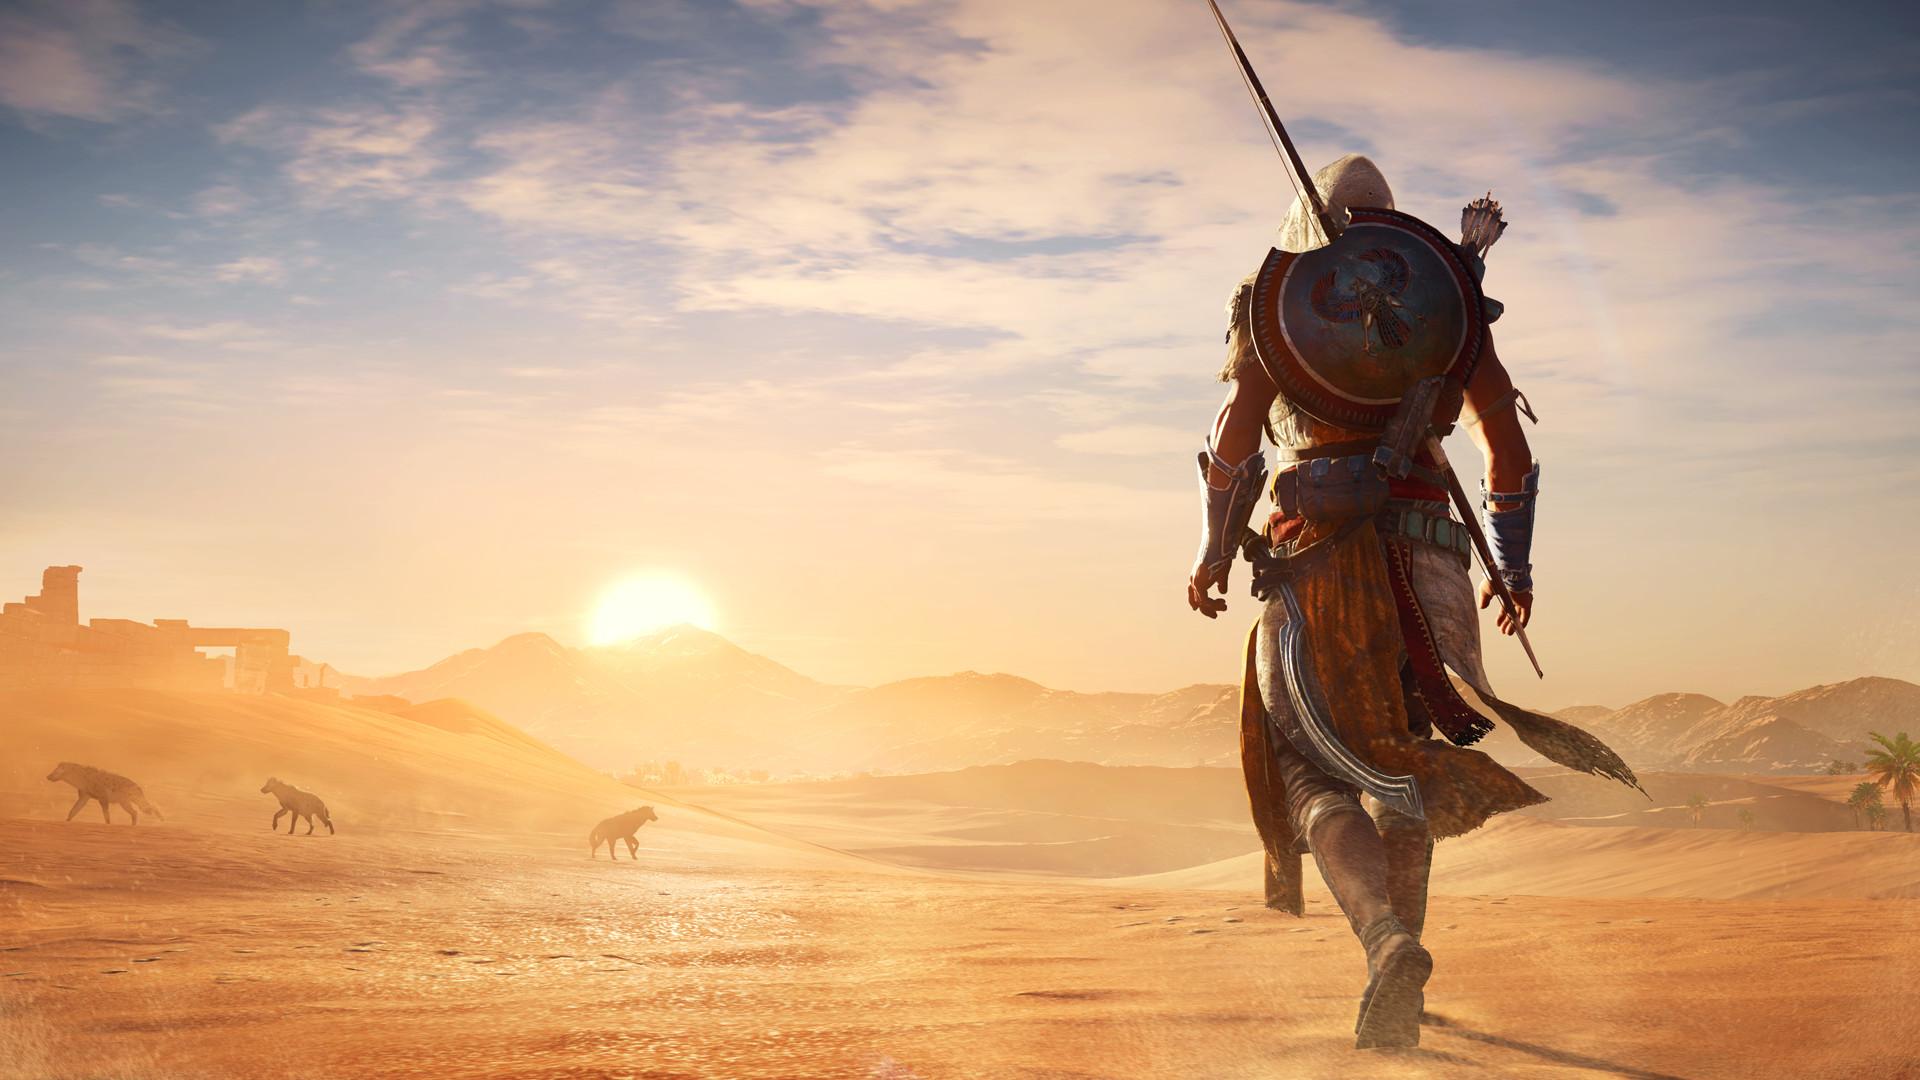 Assassin's Creed Origins | خرید سی دی کی و نسخه اورجینال بازی - ایران استیم